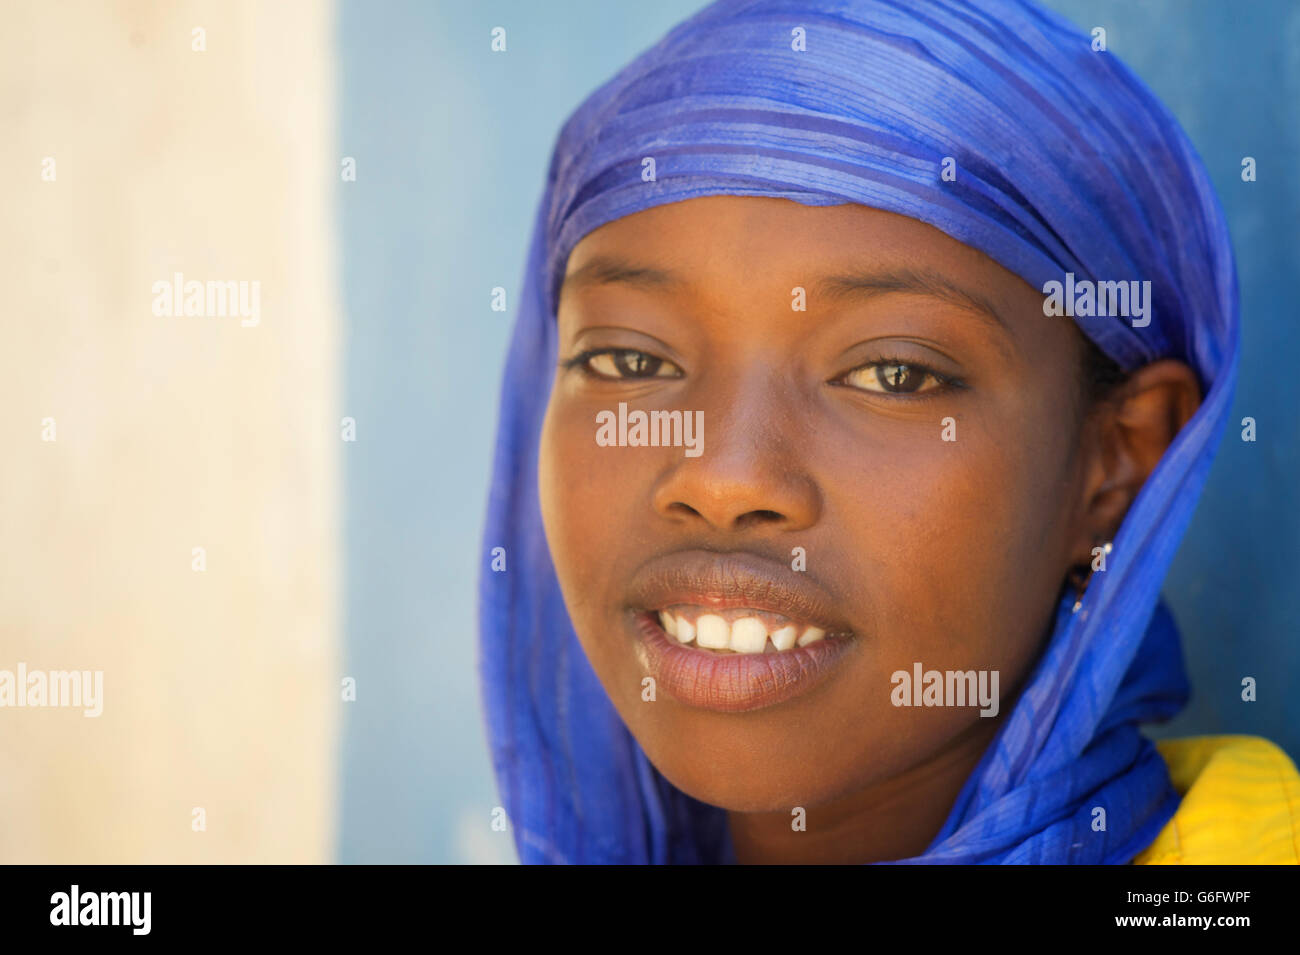 Muslim girl in a headcloth, Harar, Ethiopia - Stock Image